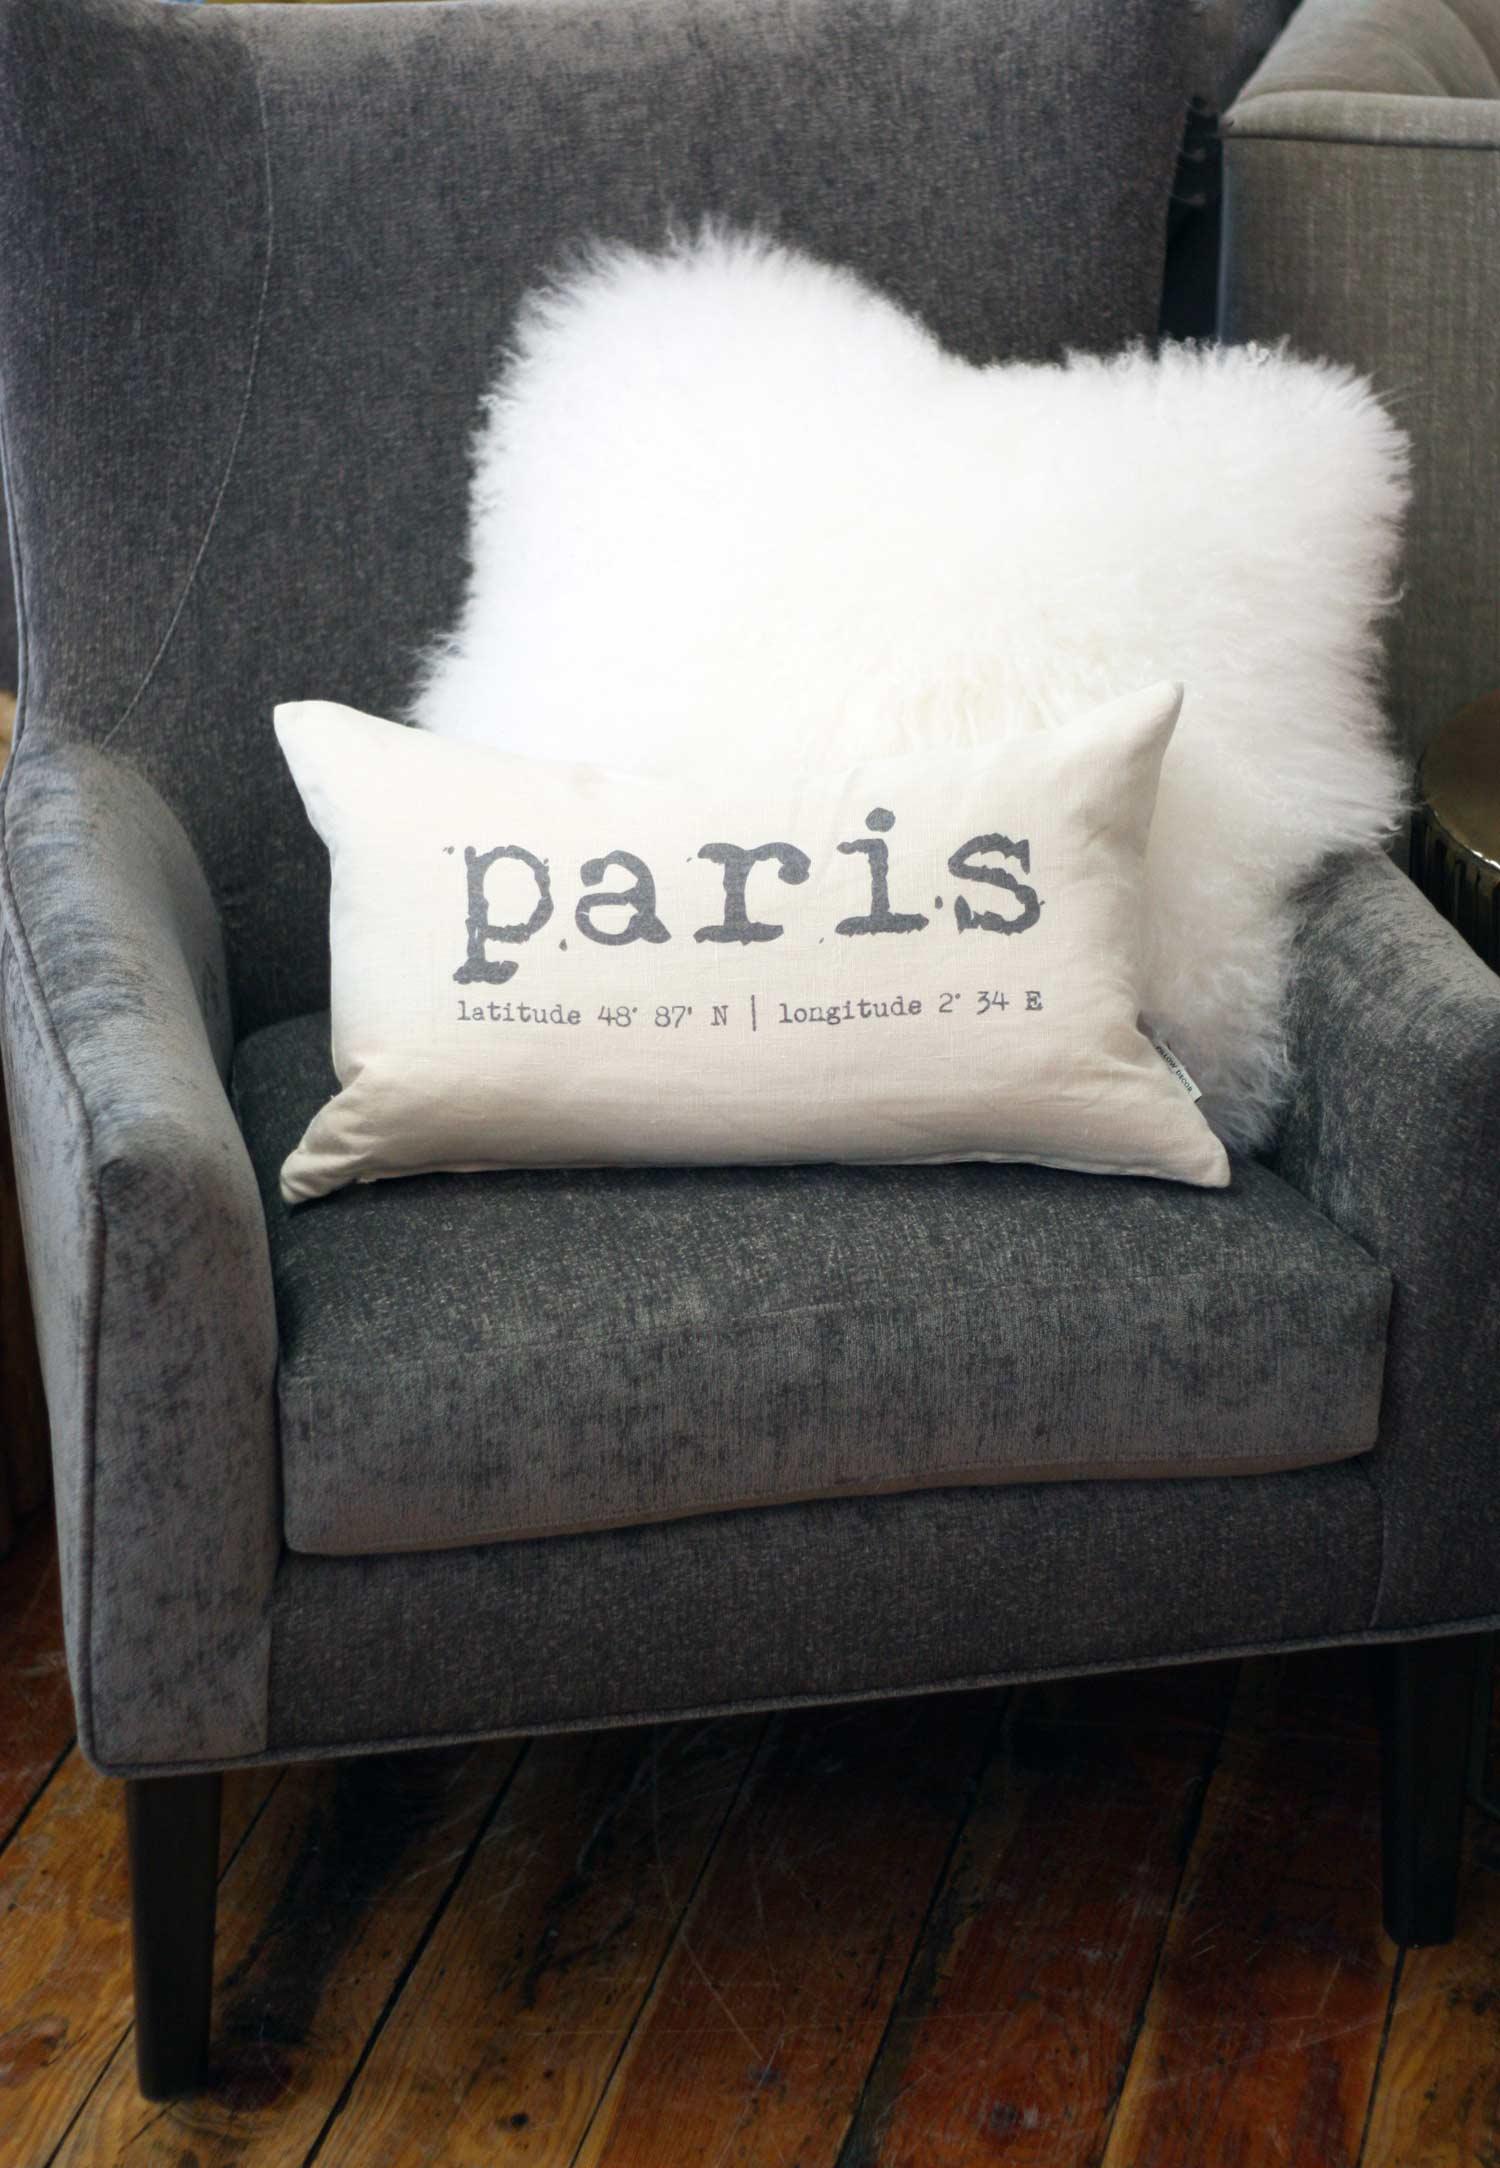 Paris on chair